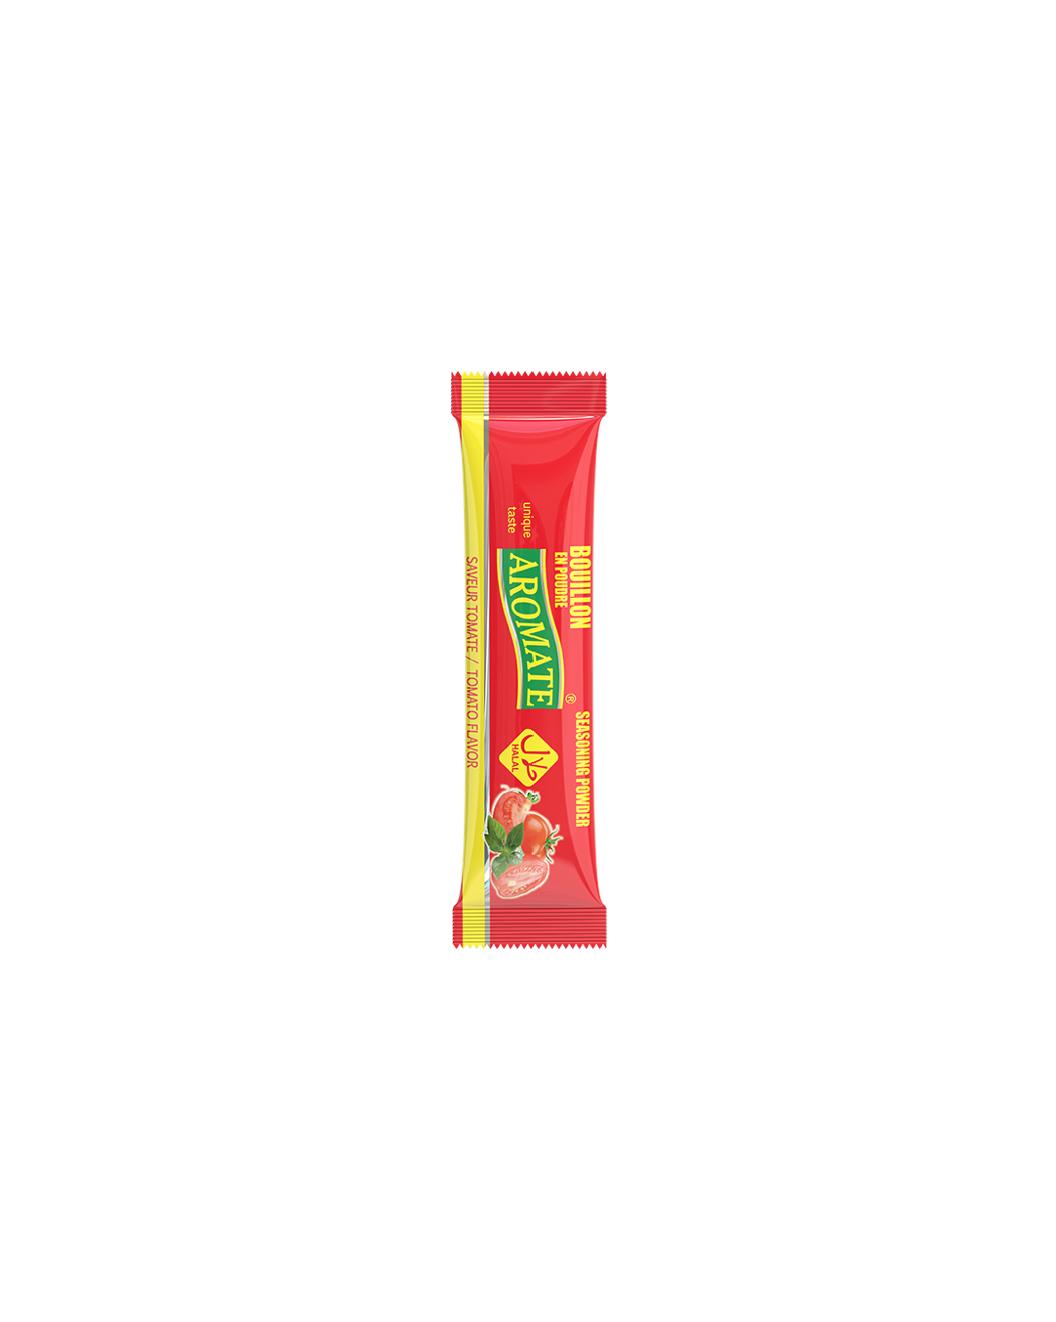 Bouillon AROMATE Tomate_Stick 15g_Siprochim